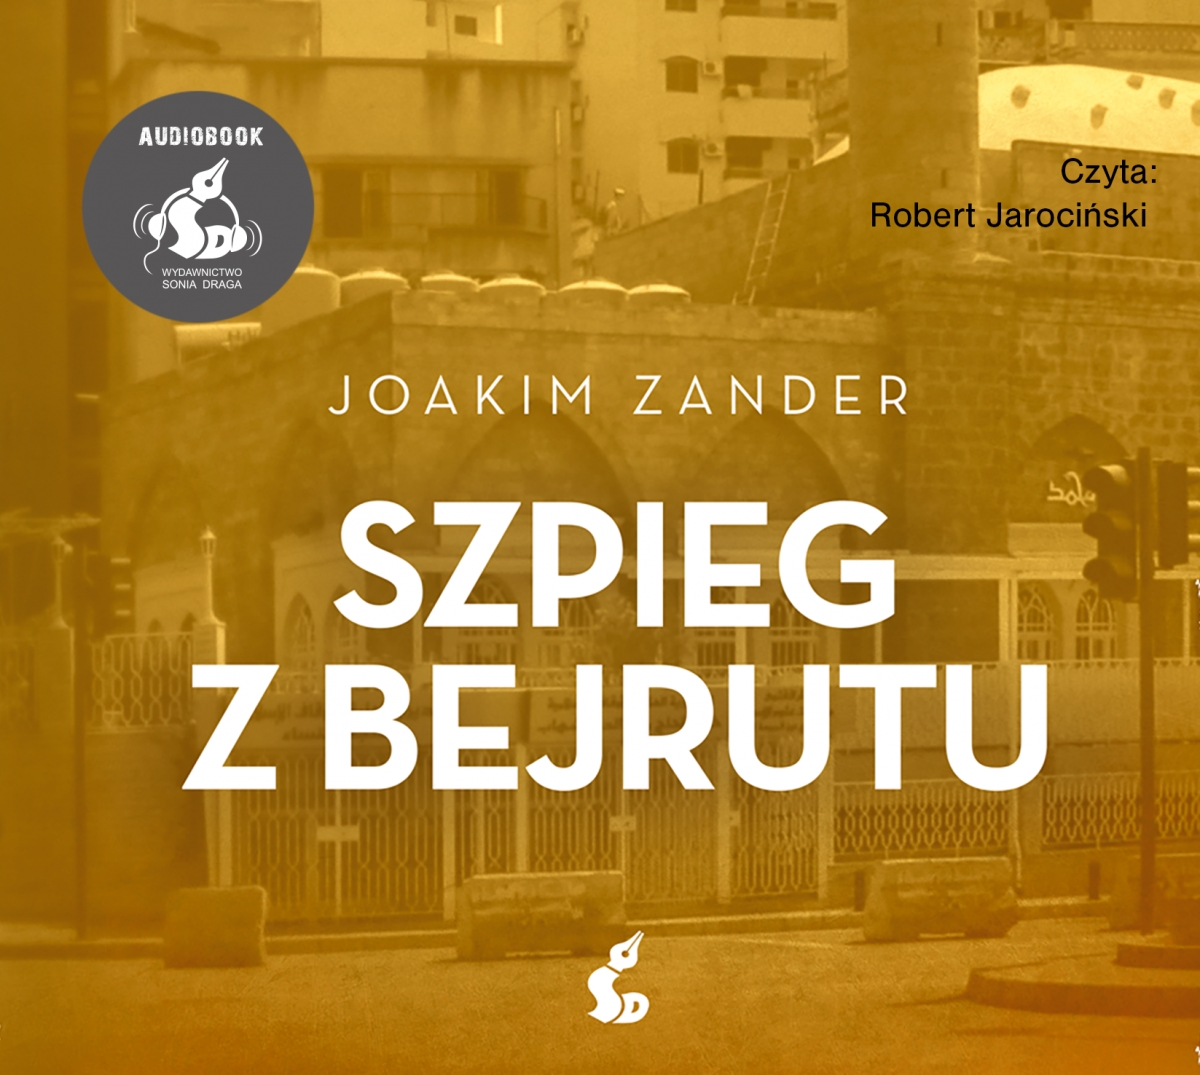 ZANDER JOAKIM – KLARA WALLDEEN 3. SZPIEG Z BEJRUTU